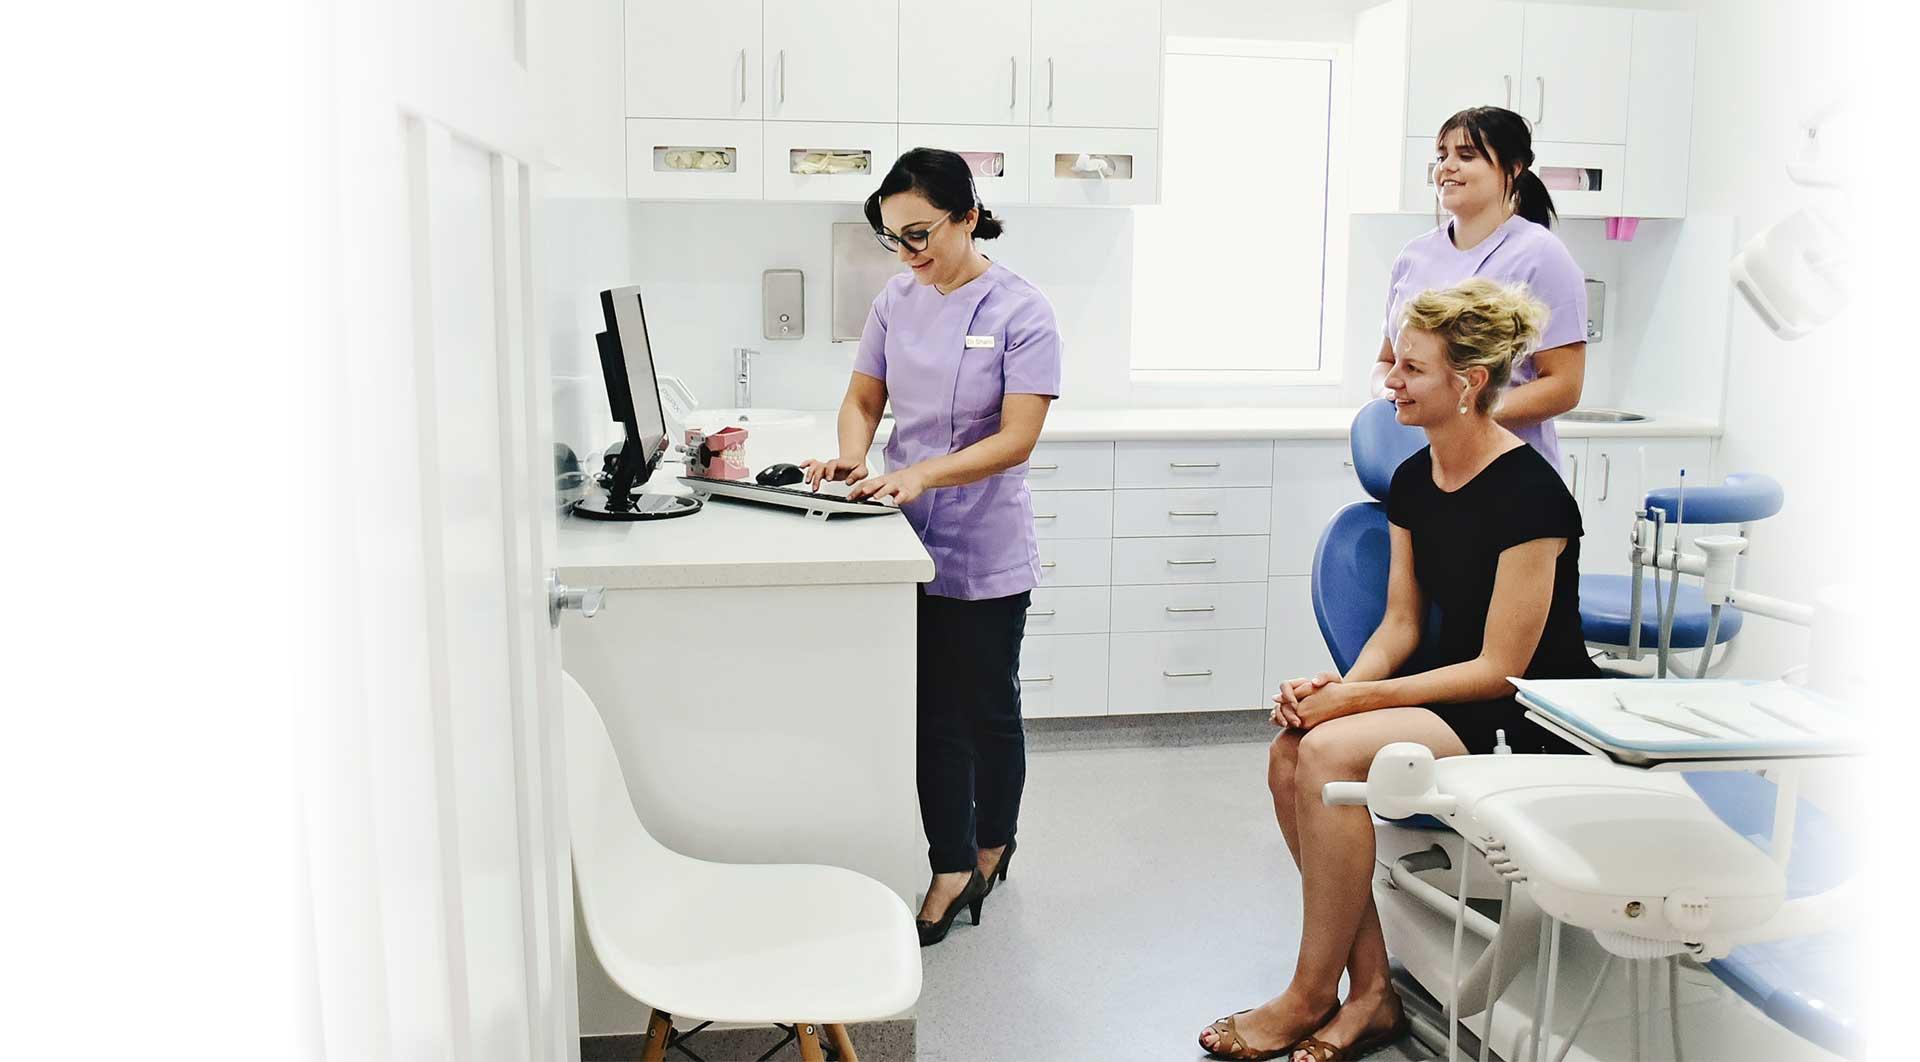 https://www.dubbodentistry.com.au/wp-content/uploads/2018/06/Dr_Shanli_patient_Dubbo_Dentist.jpg